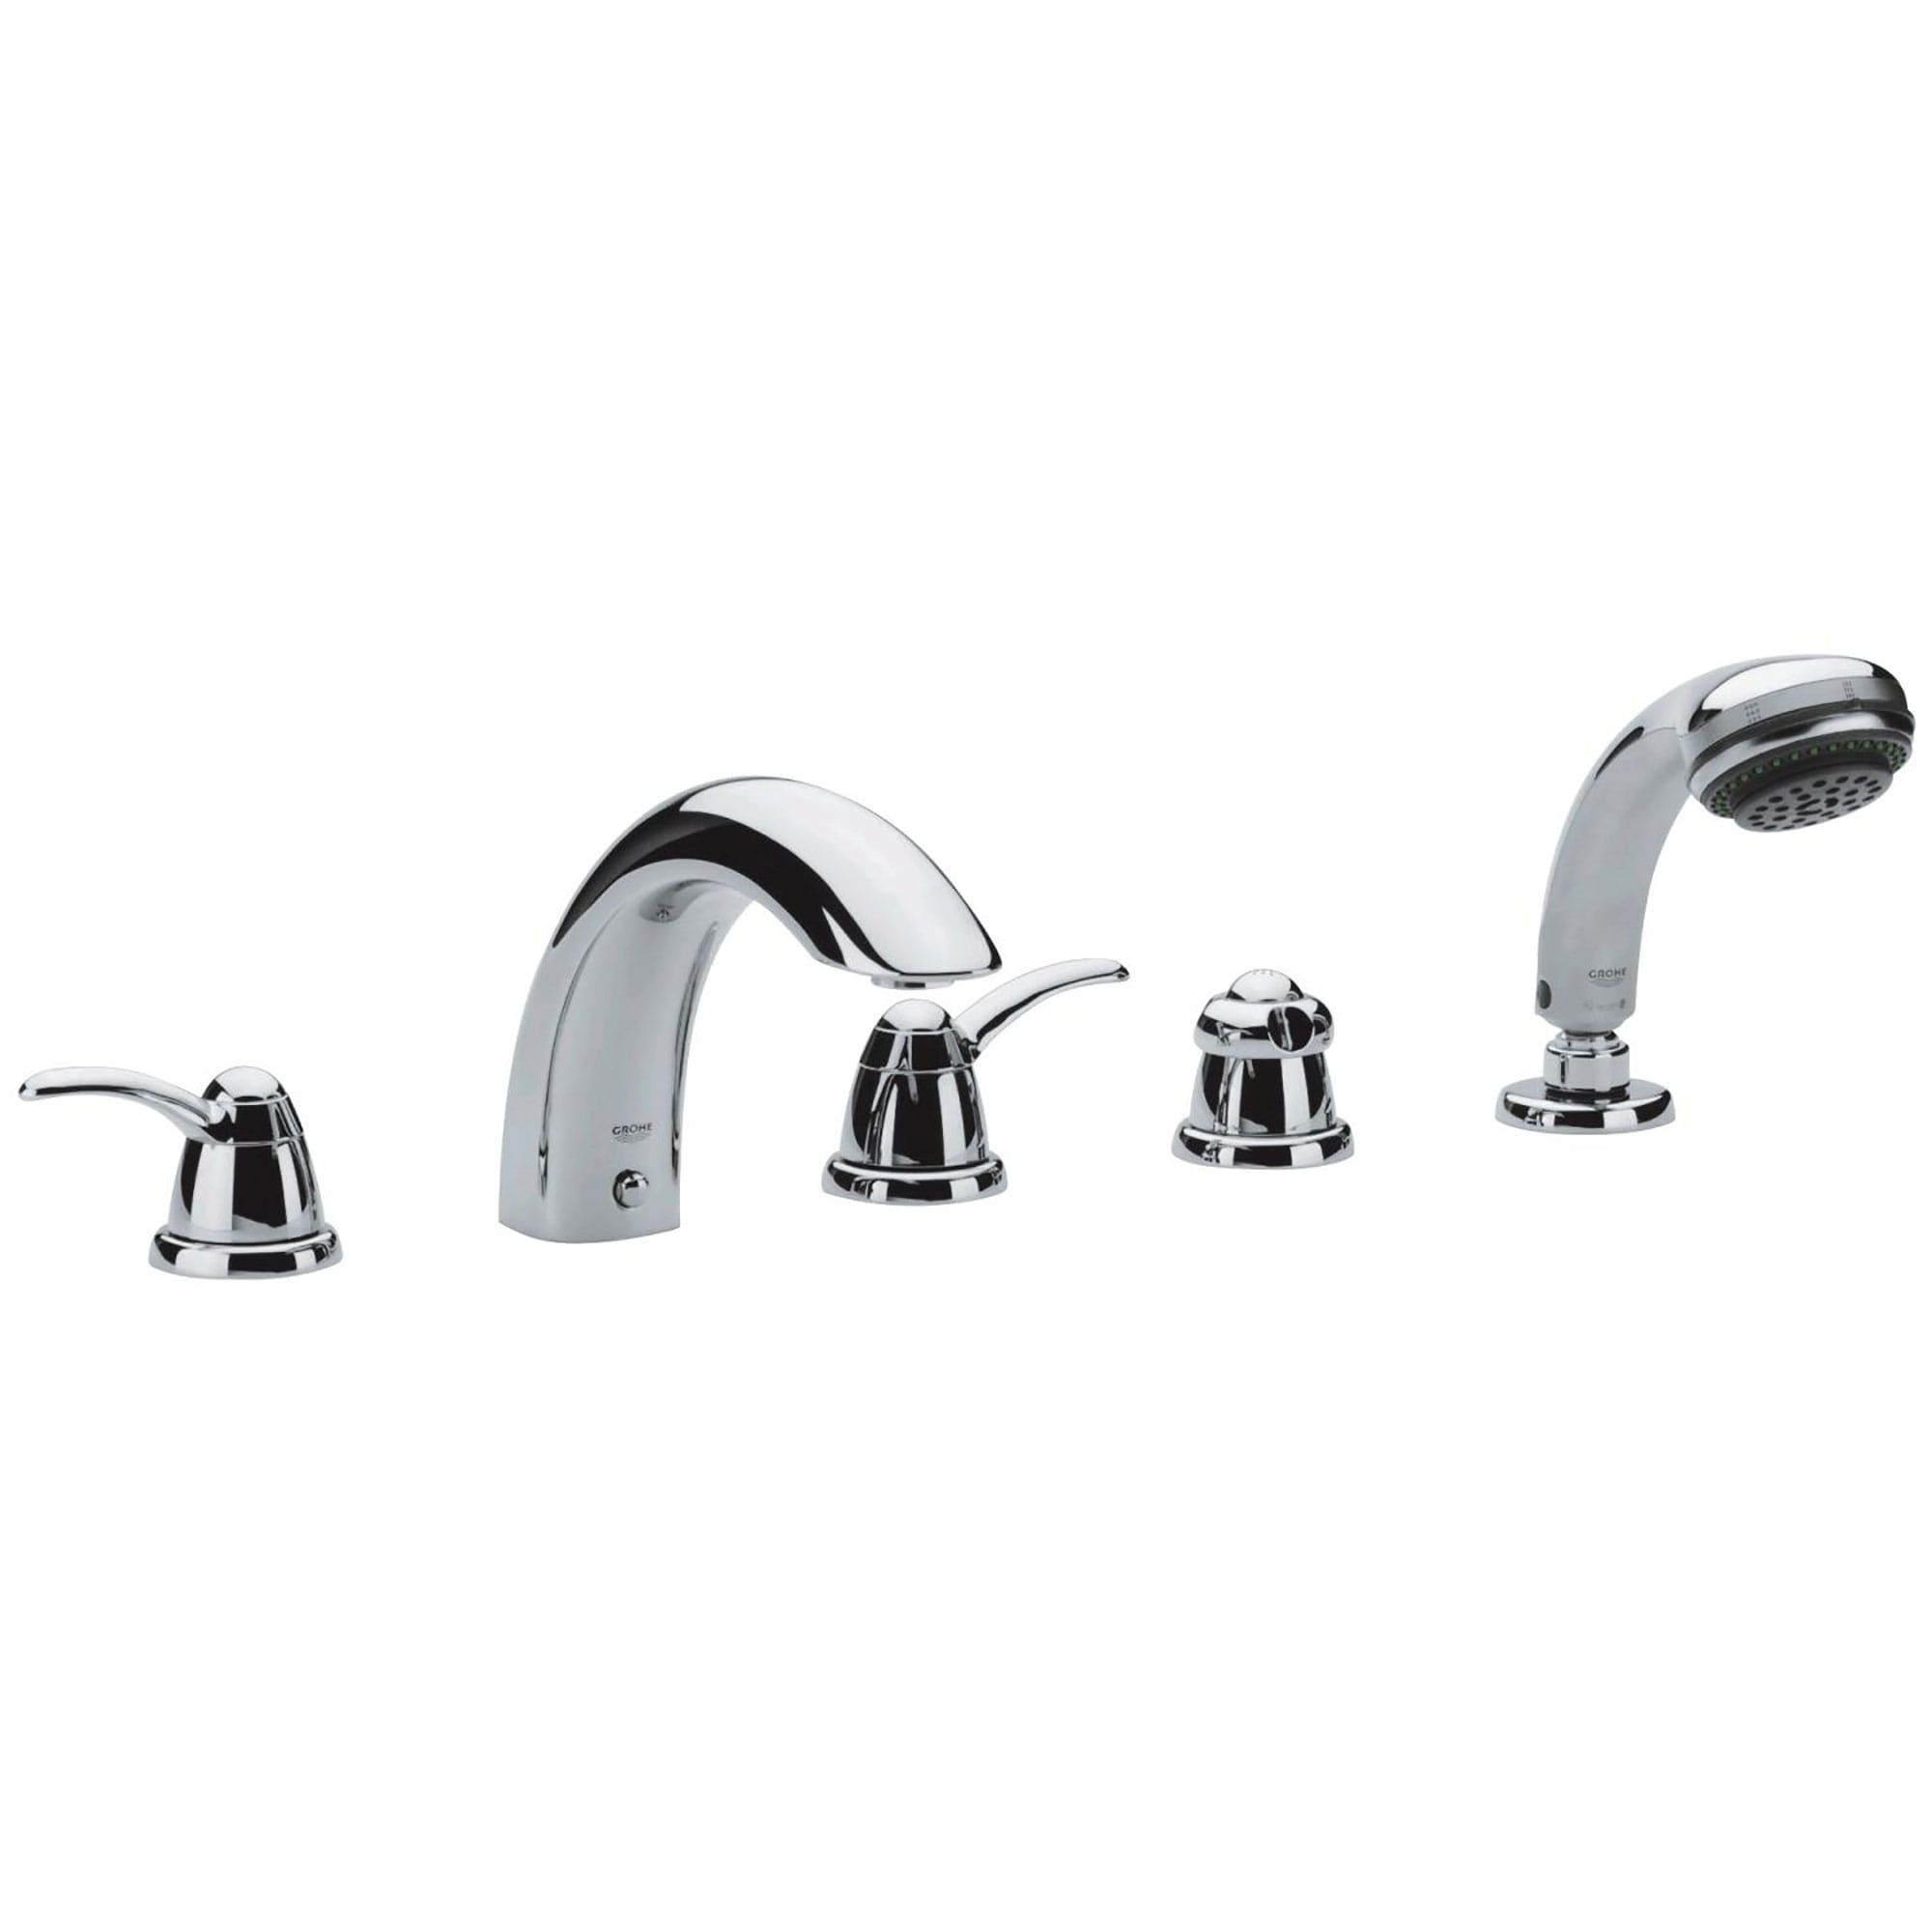 five hole bathtub faucet with handshower